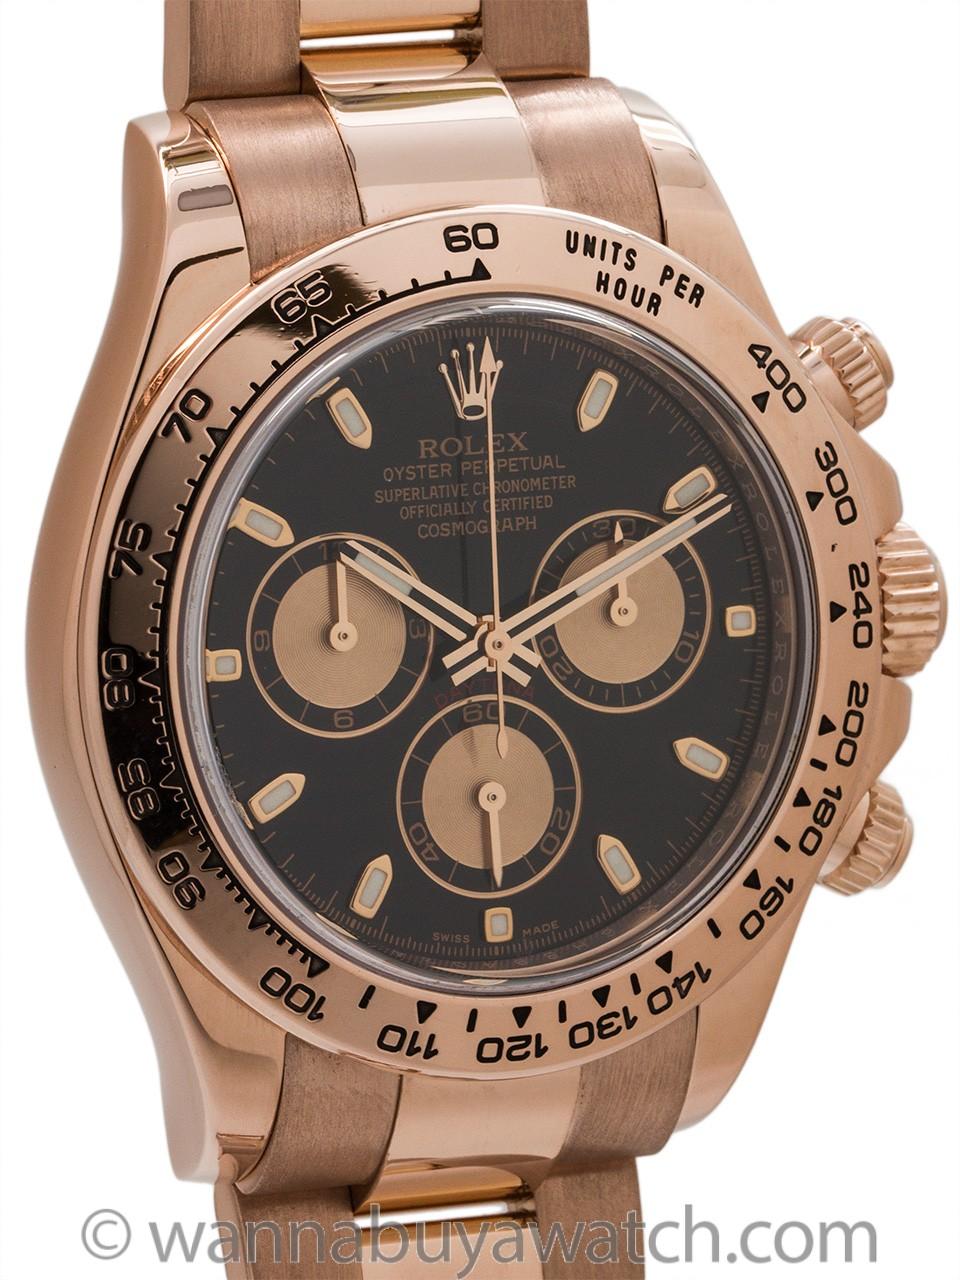 Rolex 18K PG Daytona Ref # 116505 circa 2010 Black Dial